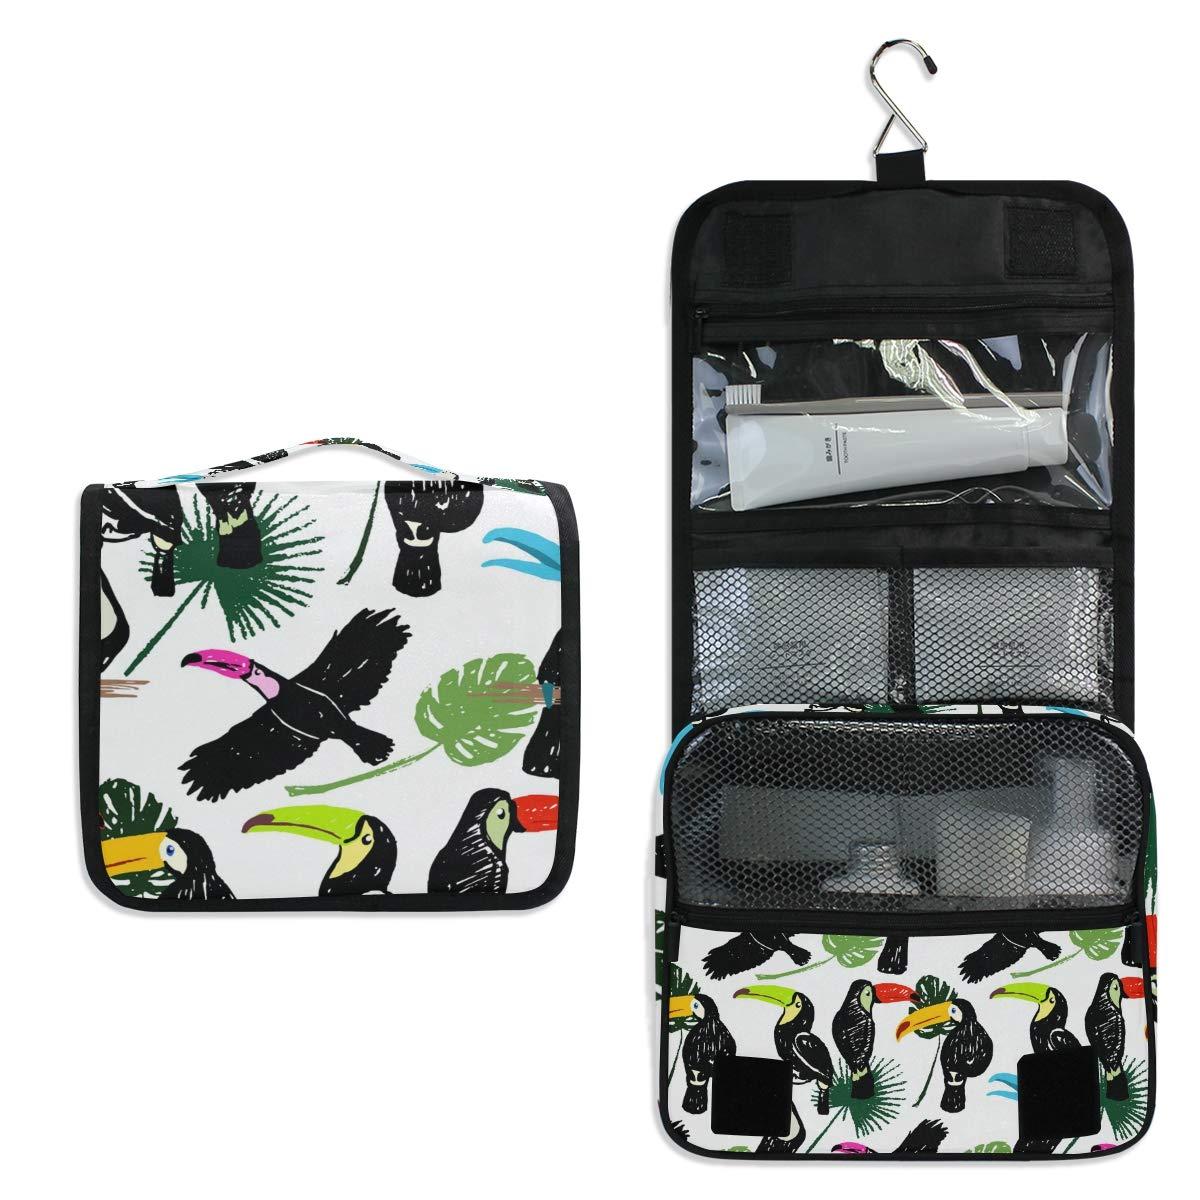 Toiletry Bag Travel Bag Hanging Hook - Tucan Pattern Waterproof Cosmetic Bag Portable Makeup Pouch for Toiletries Bathroom